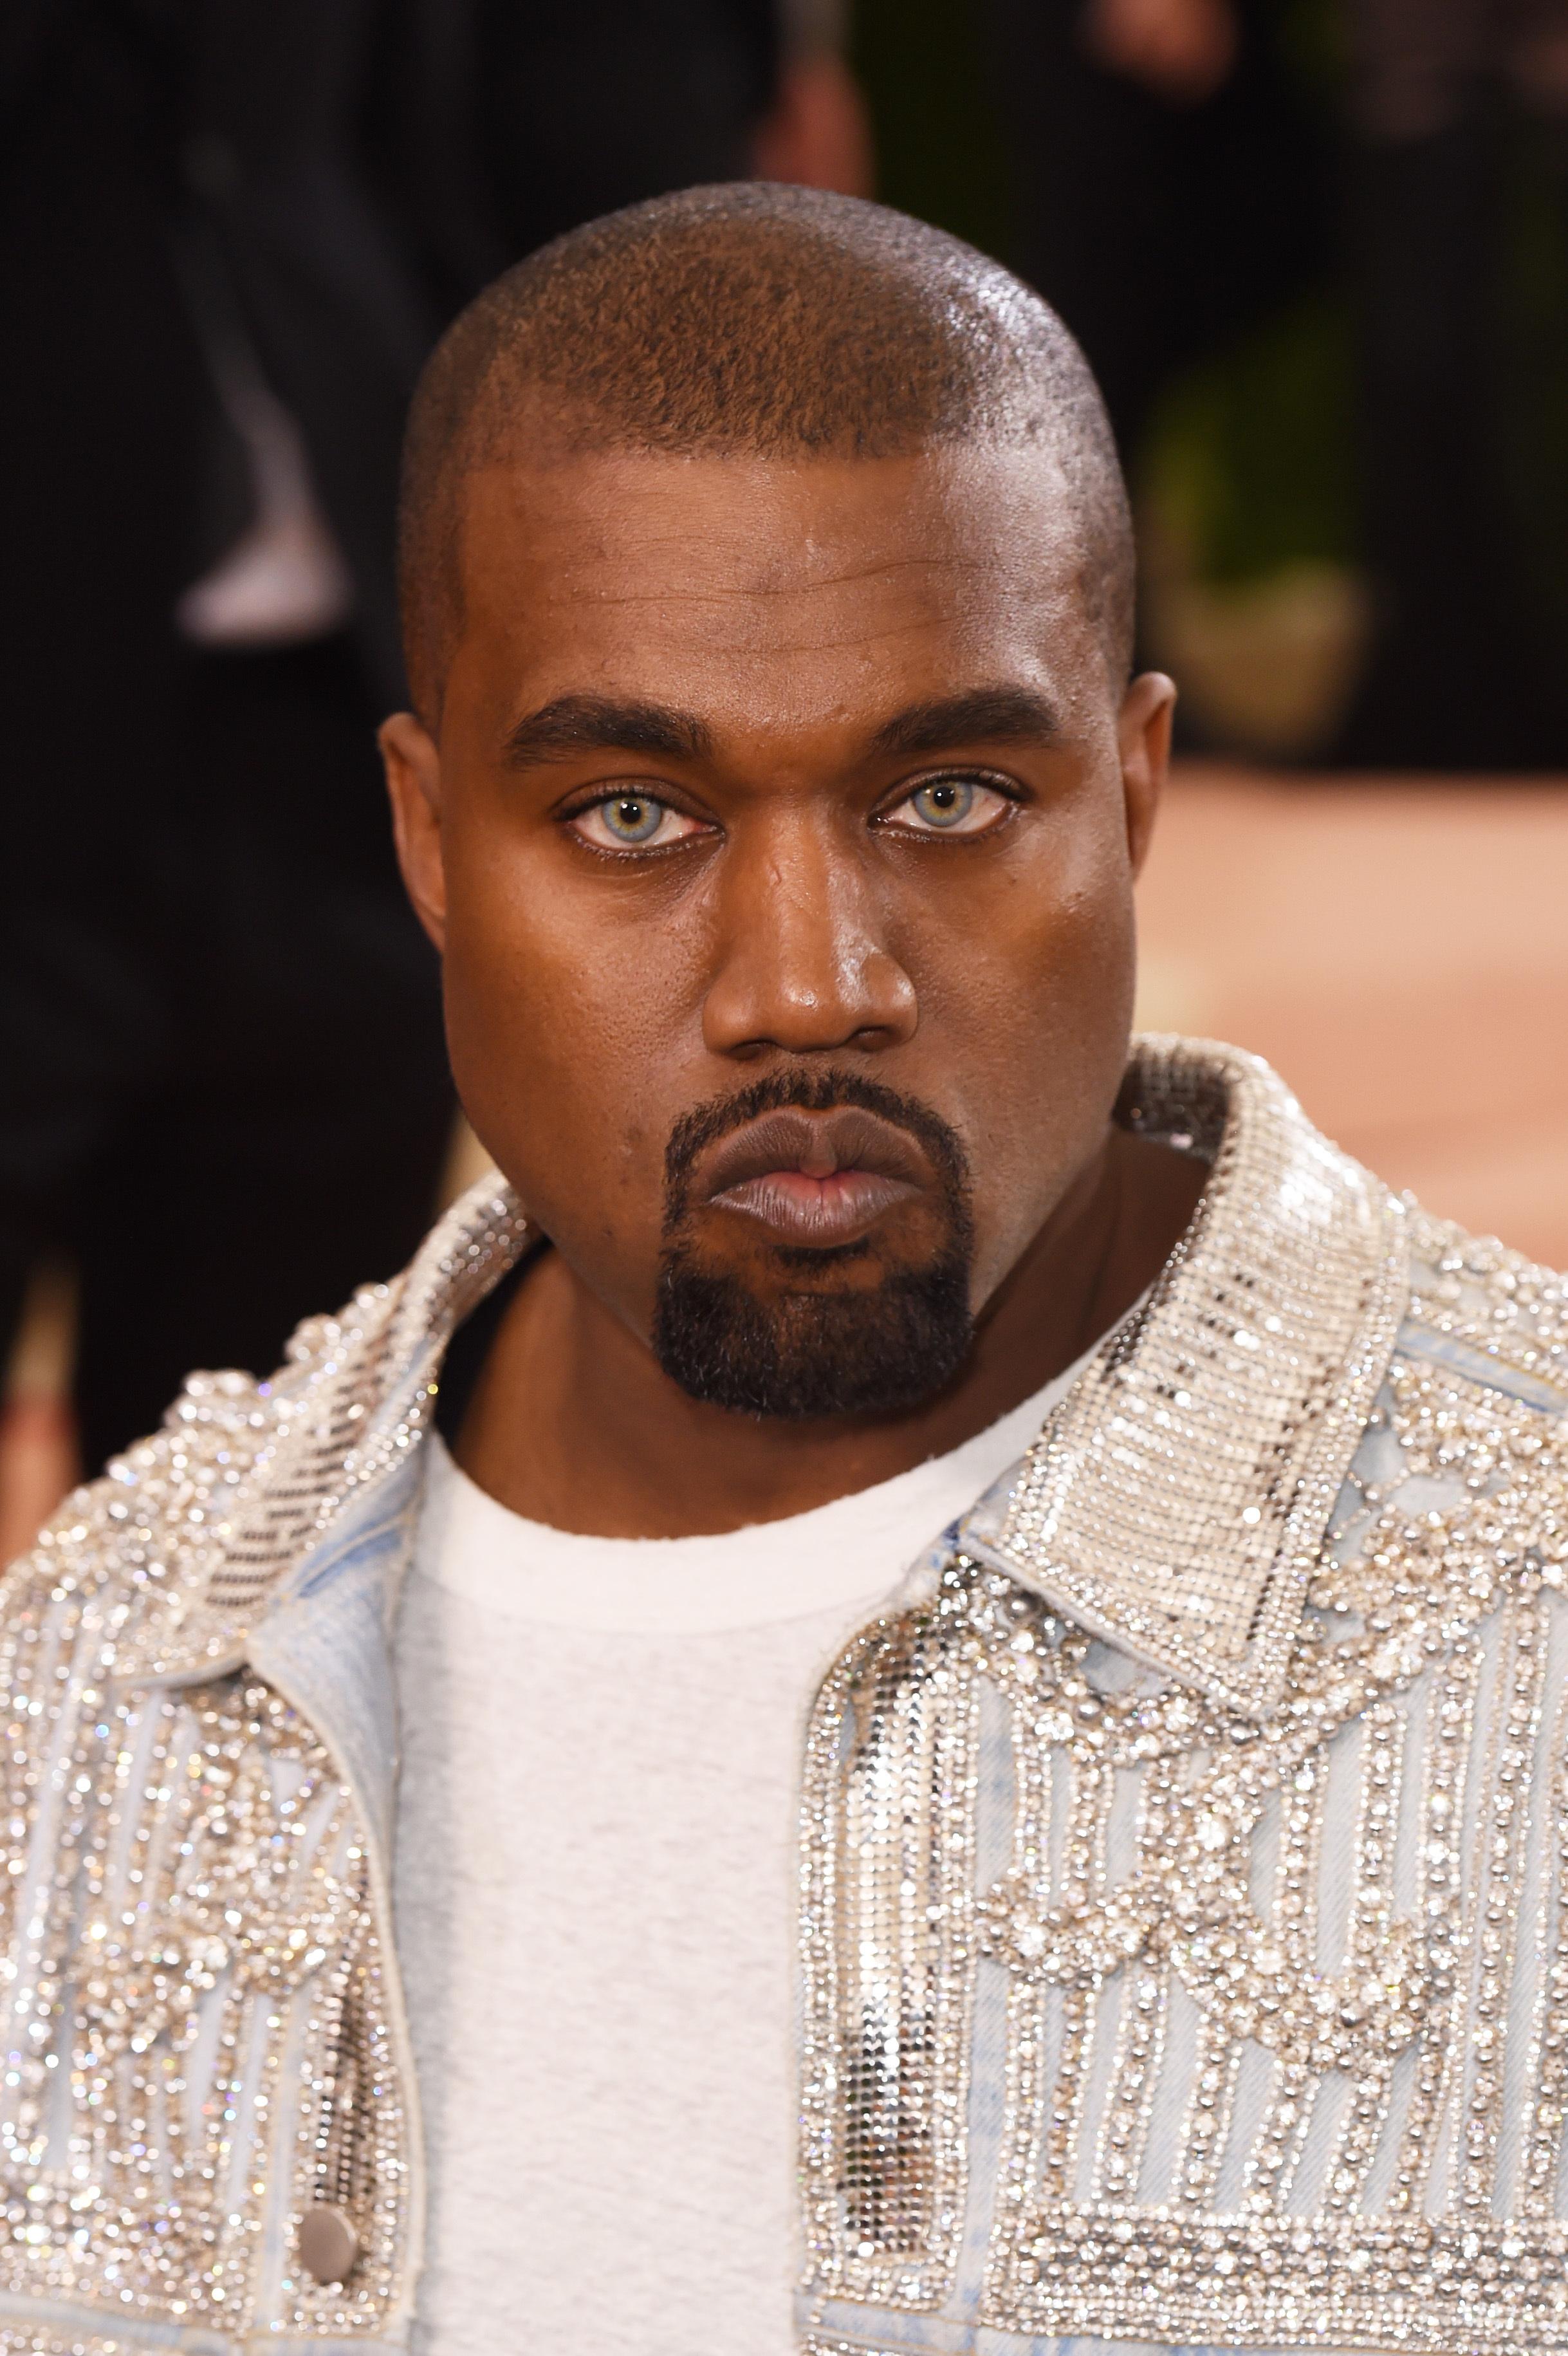 Kanye West slams Kid Cudi for disrespecting him